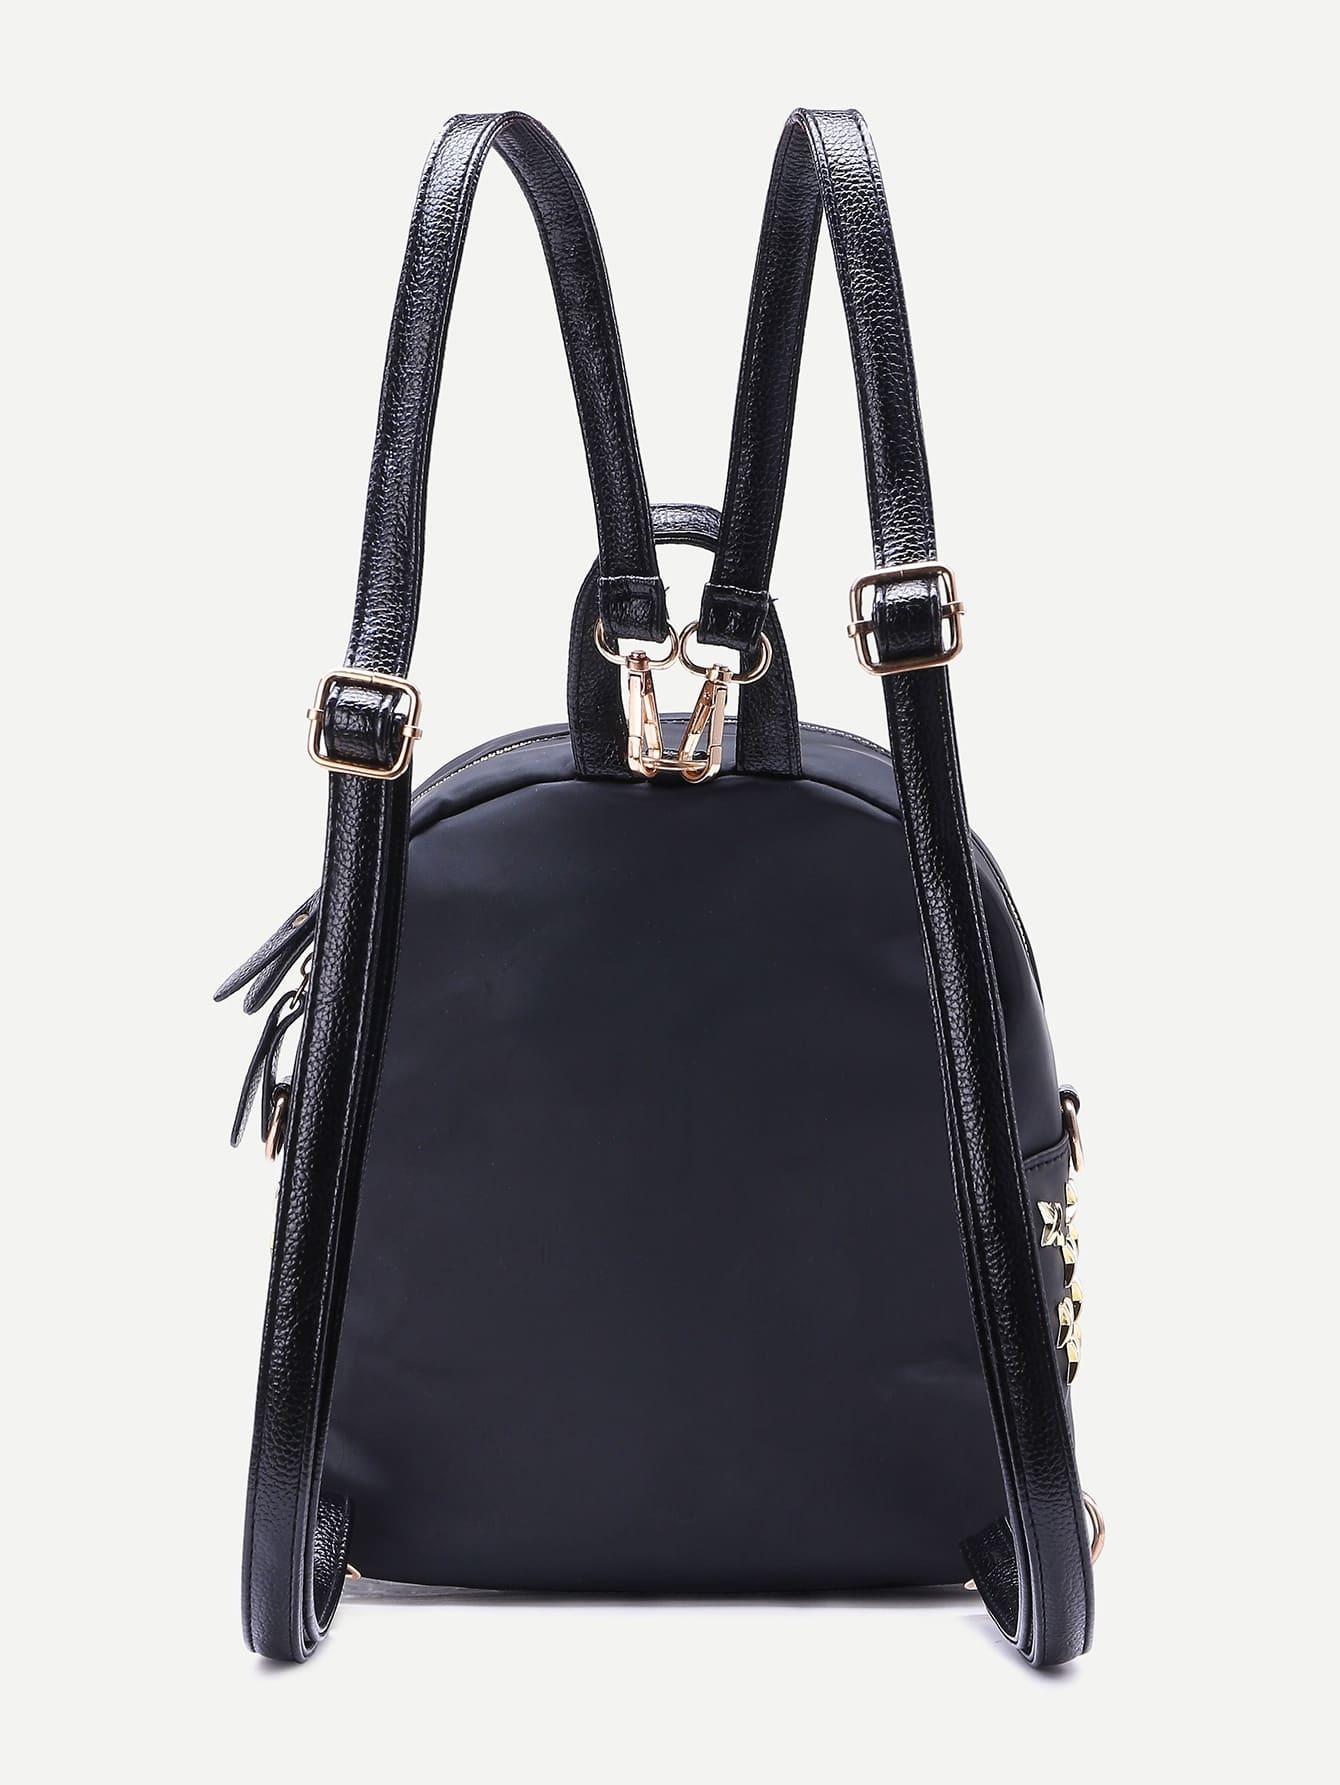 bag160829914_2